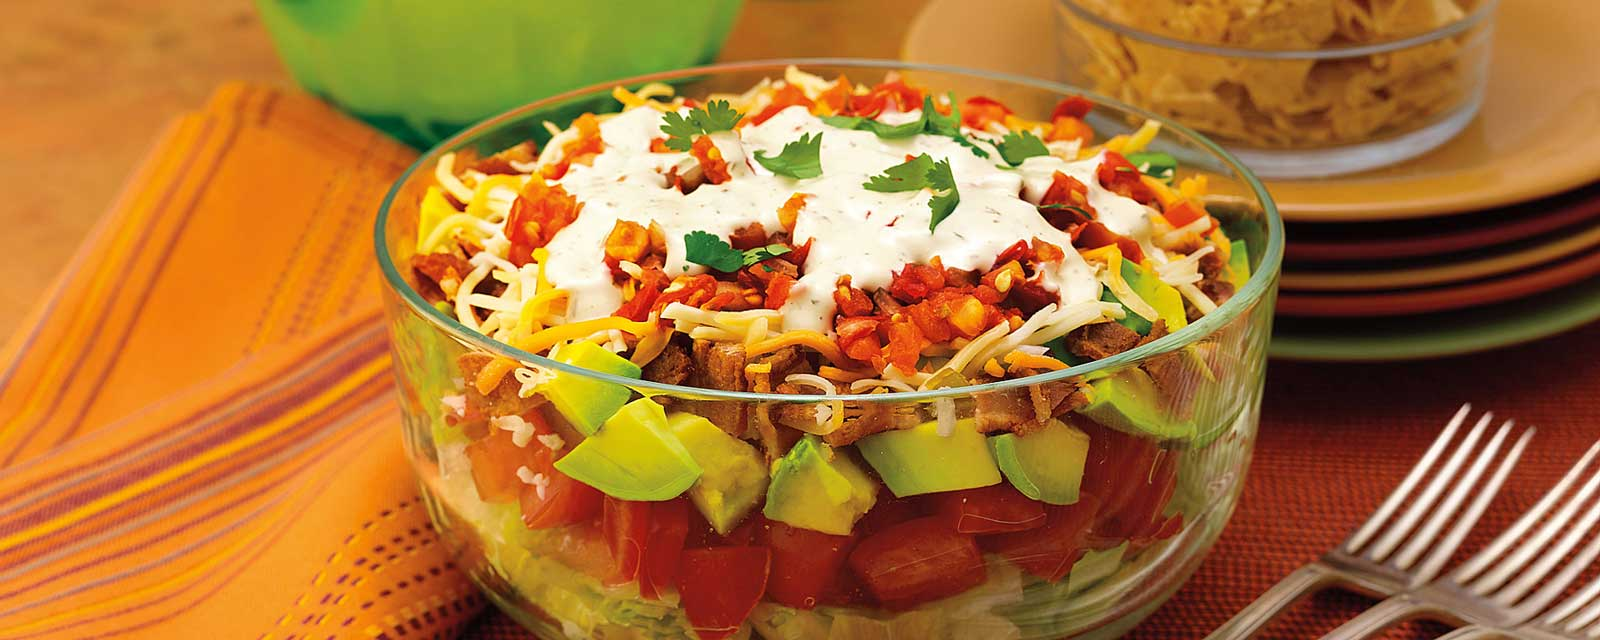 Ranch Fiesta BLT Salad